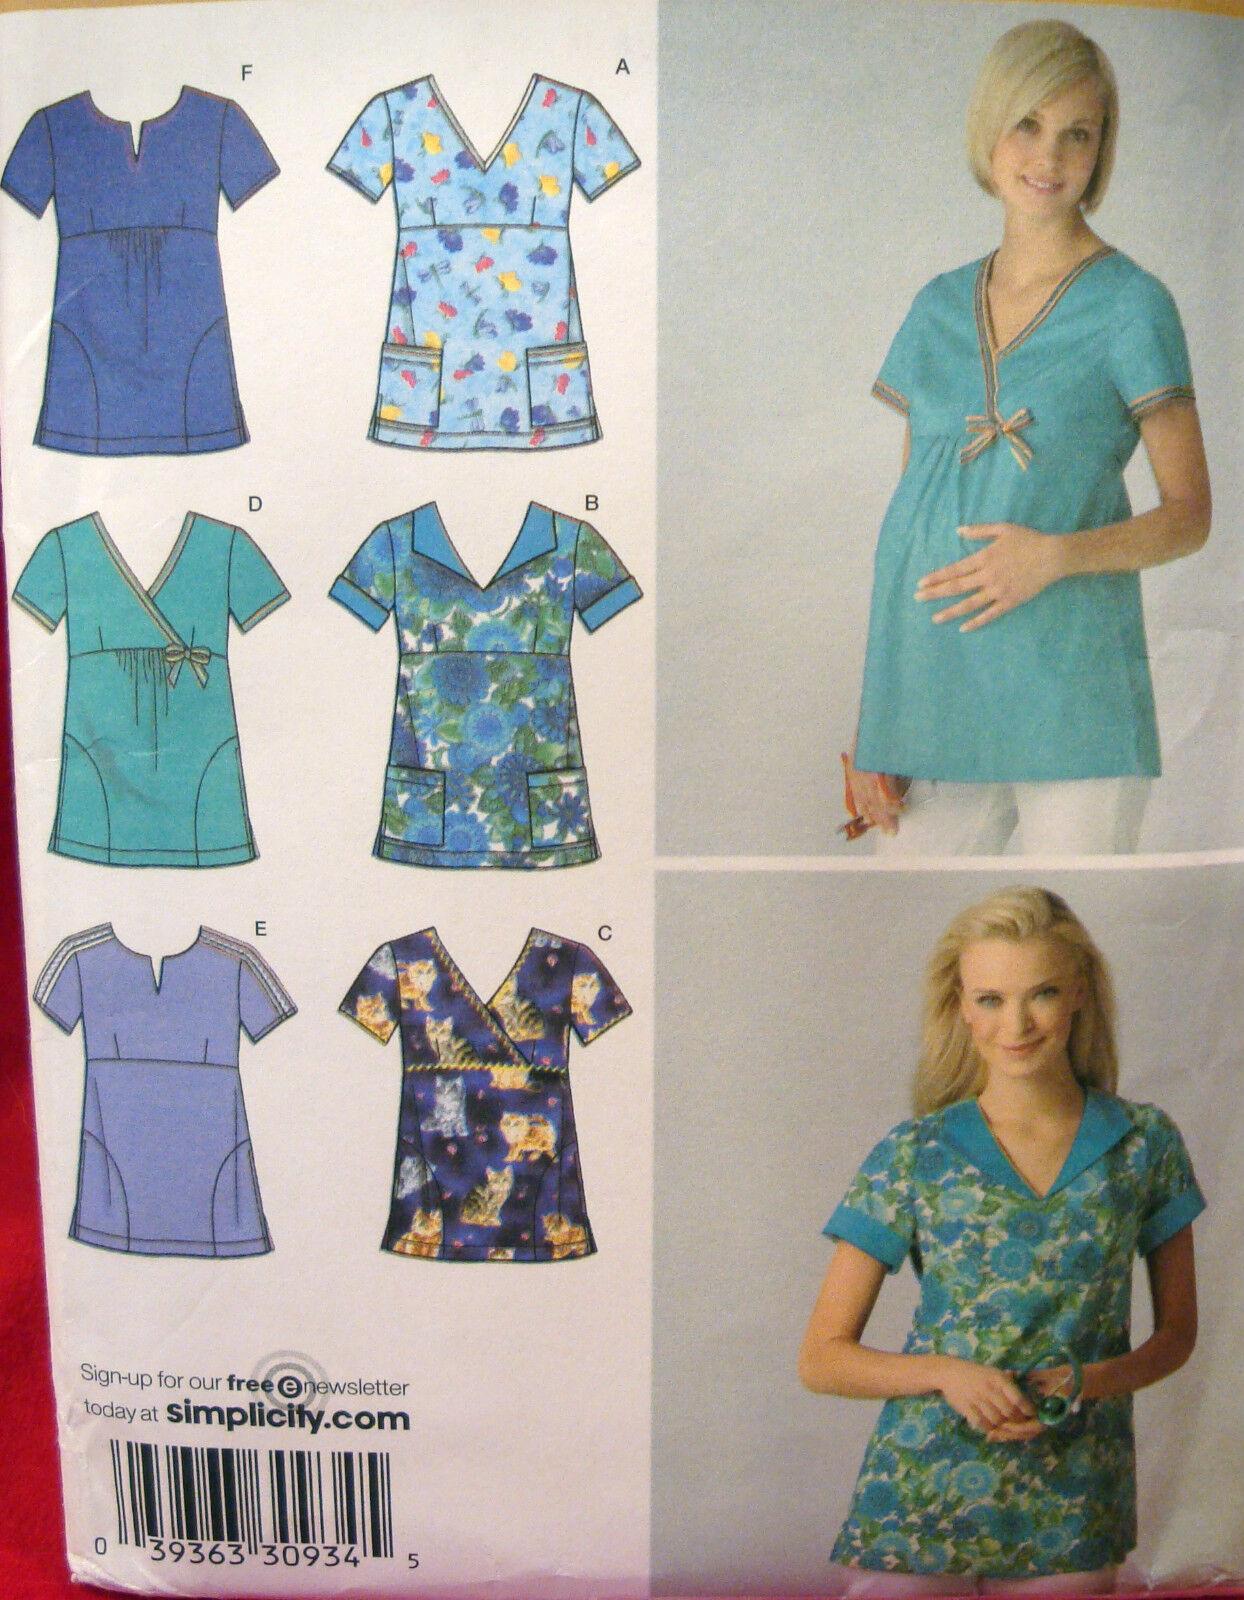 Scrubs sewing pattern misses maternity plus size uniform top picture 1 of 3 jeuxipadfo Choice Image